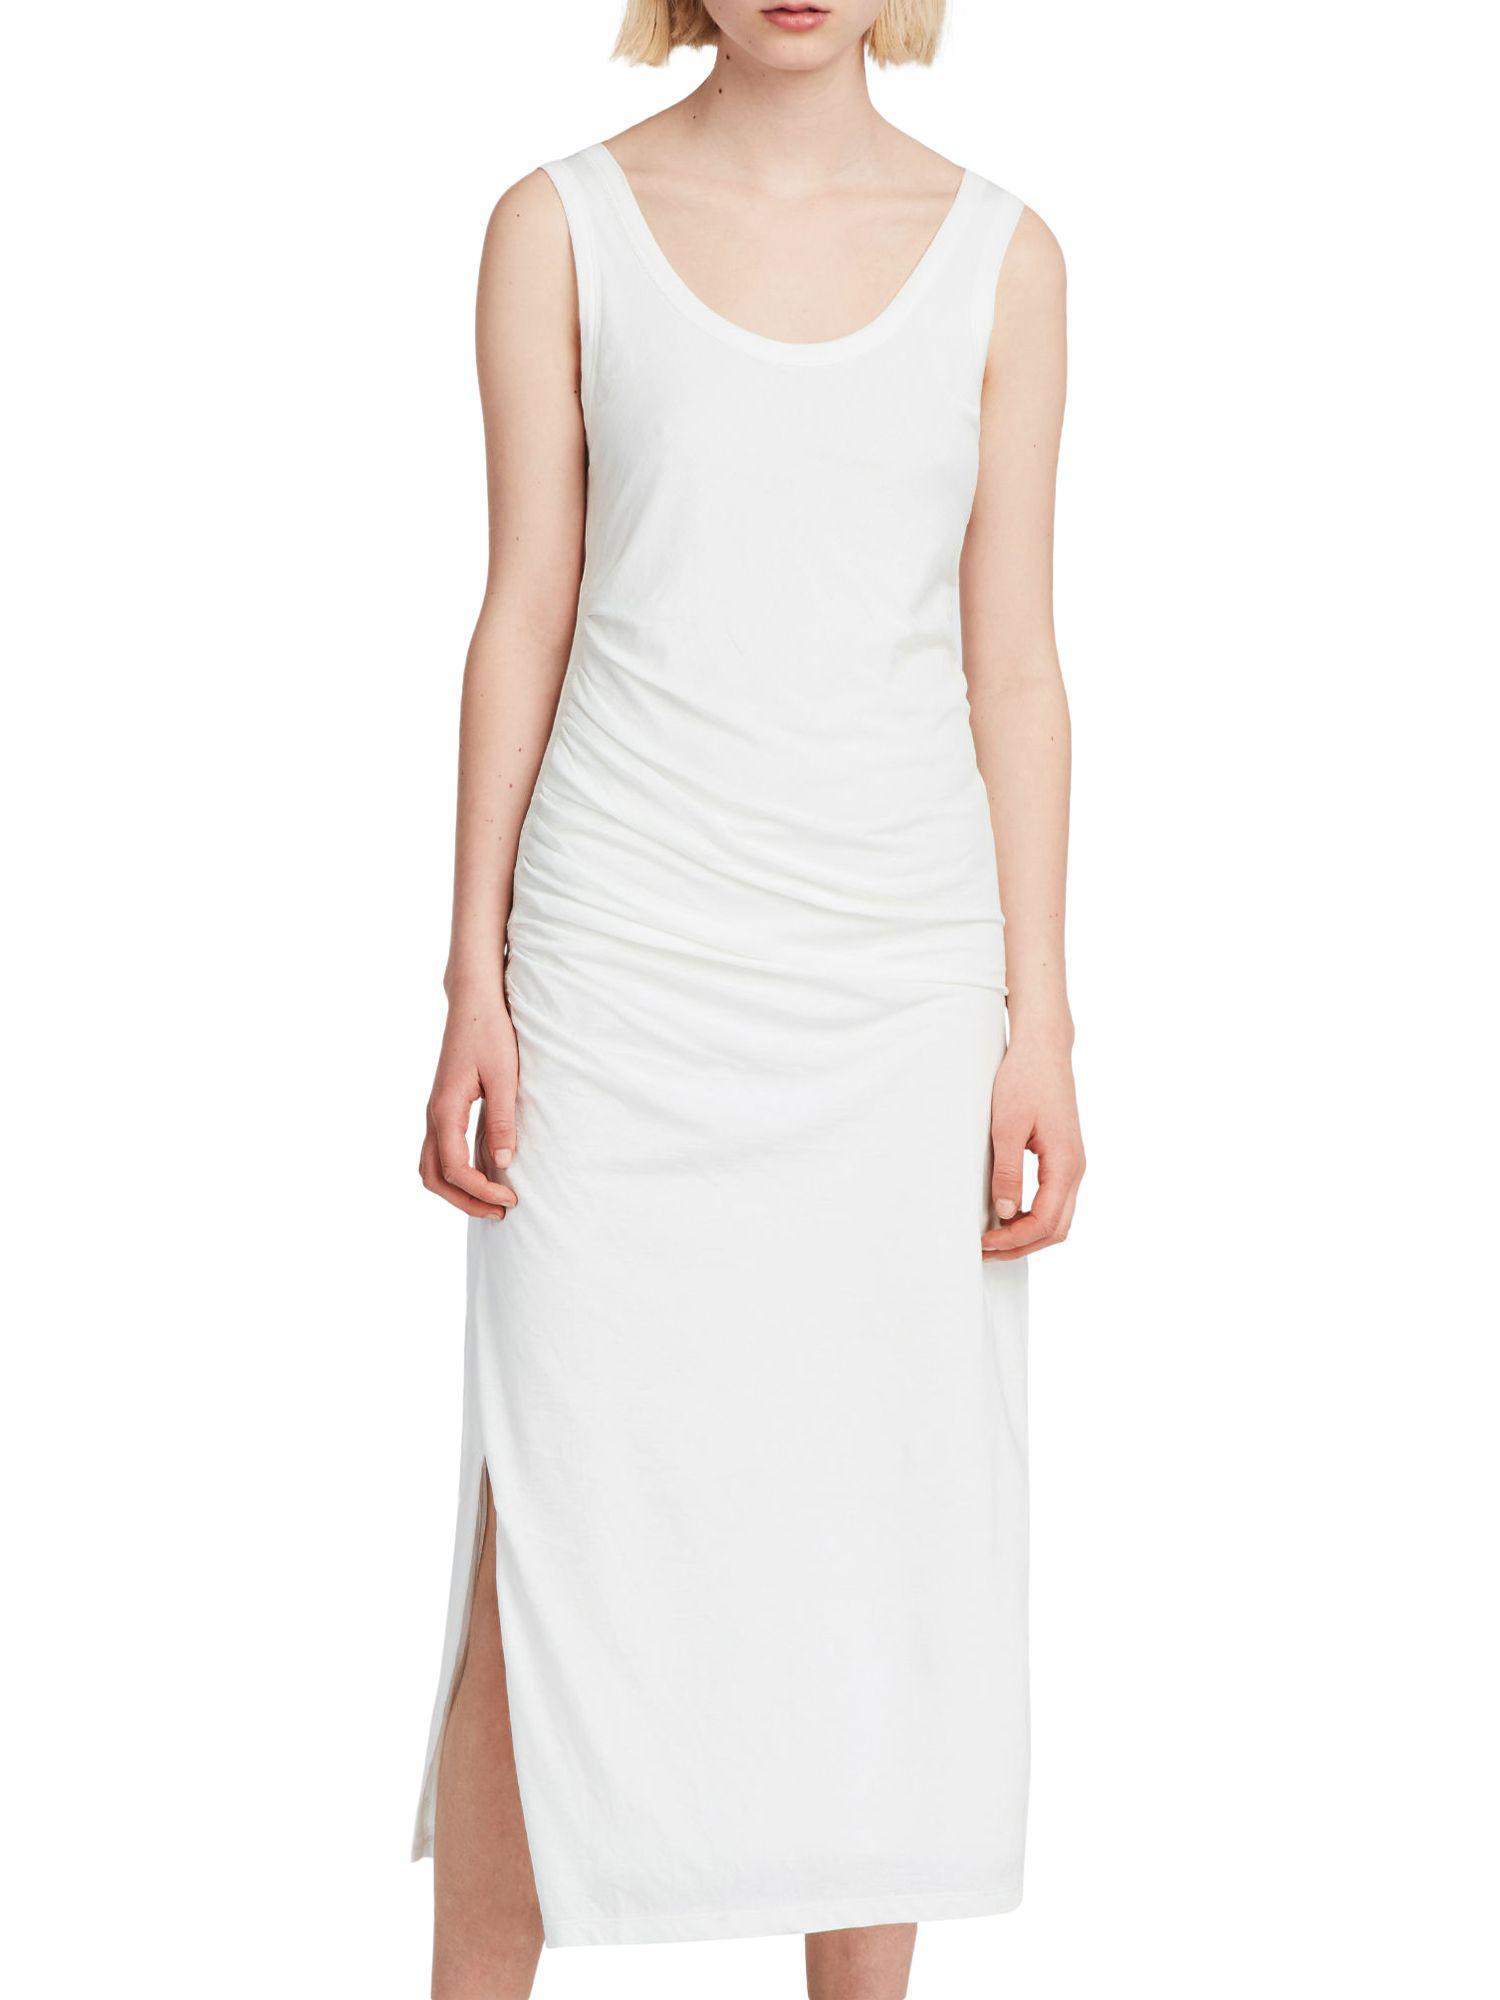 8aa4e8edec AllSaints Tina Dress in White - Lyst